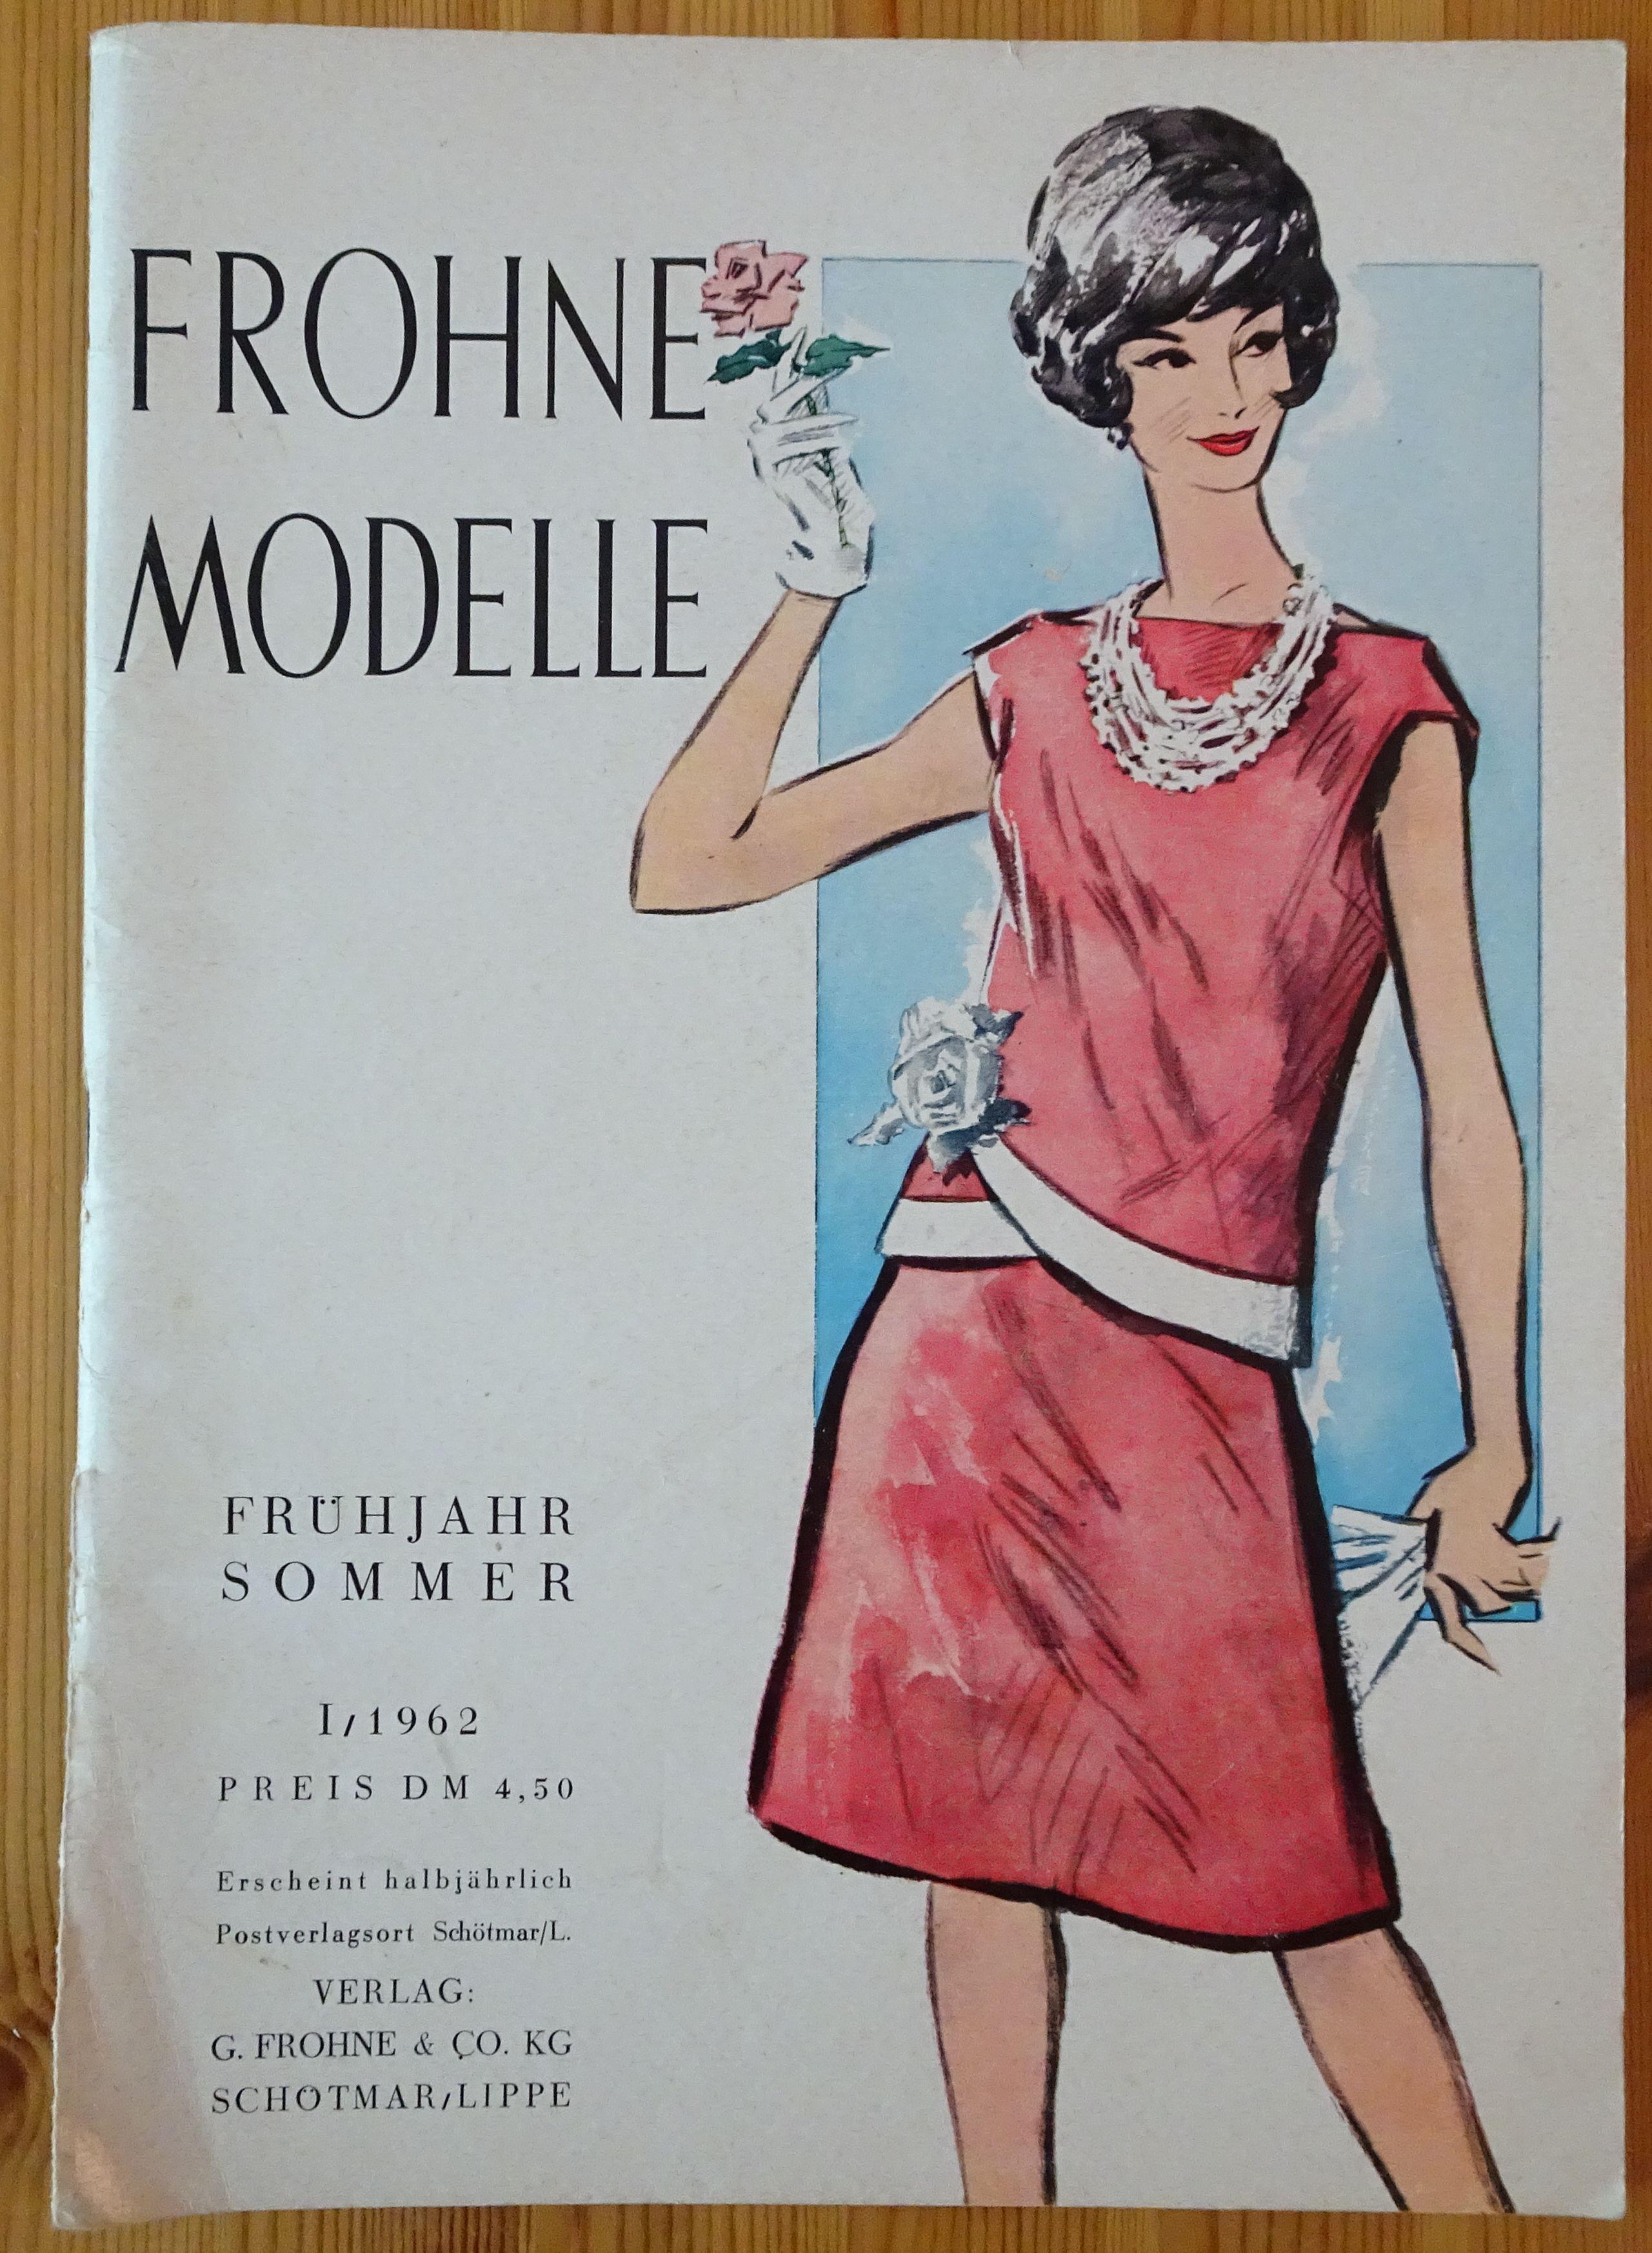 Frohne Modelle 1/1962